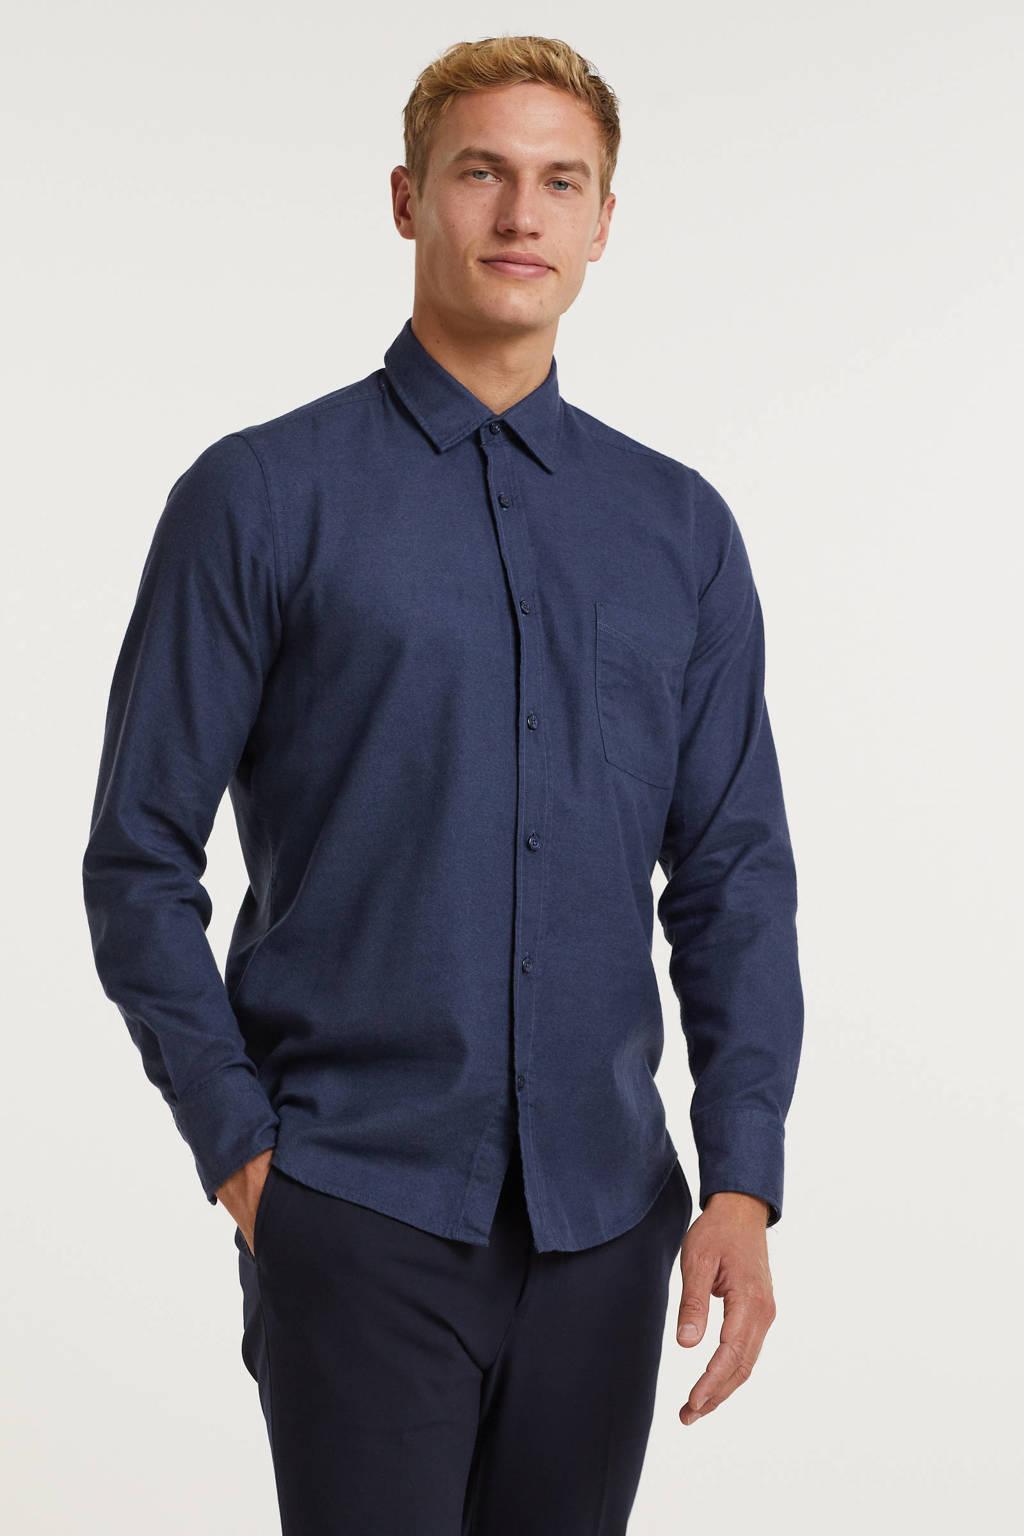 BOSS Casual regular fit overhemd Relegant 404 dark blue, 404 Dark Blue